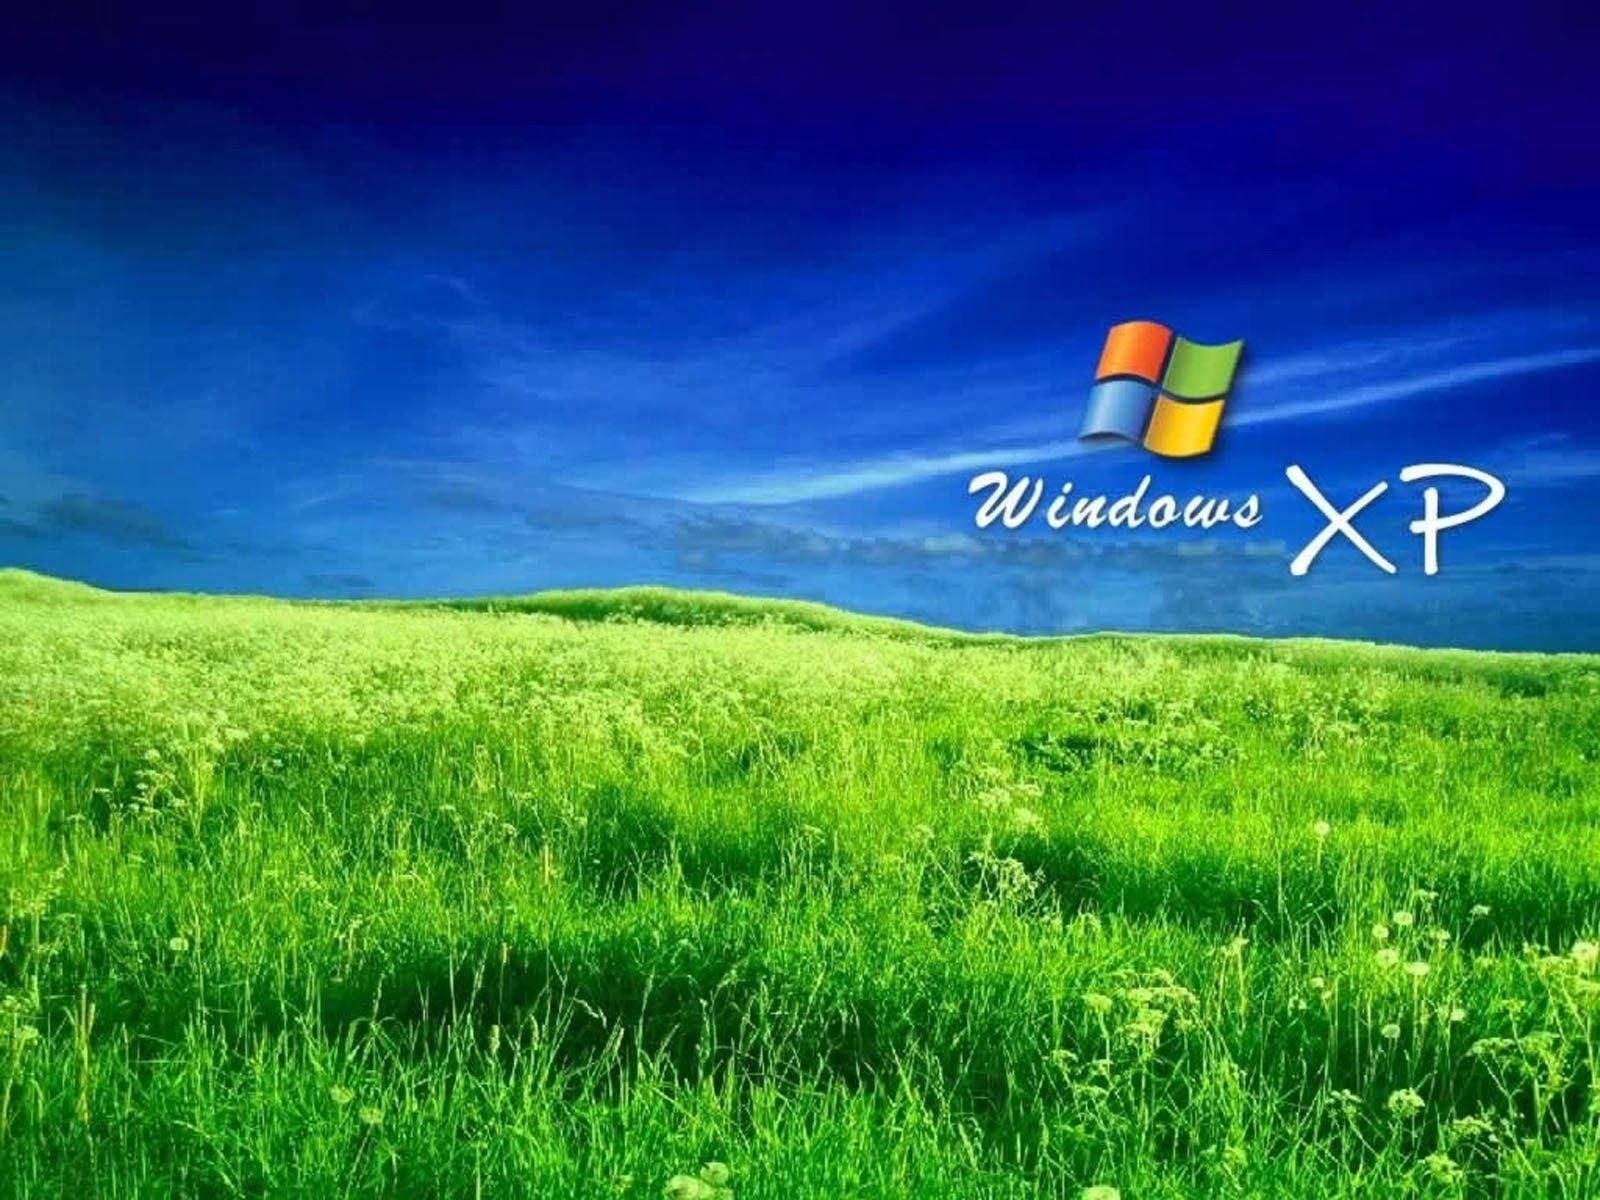 free windows xp wallpapers wallpaper